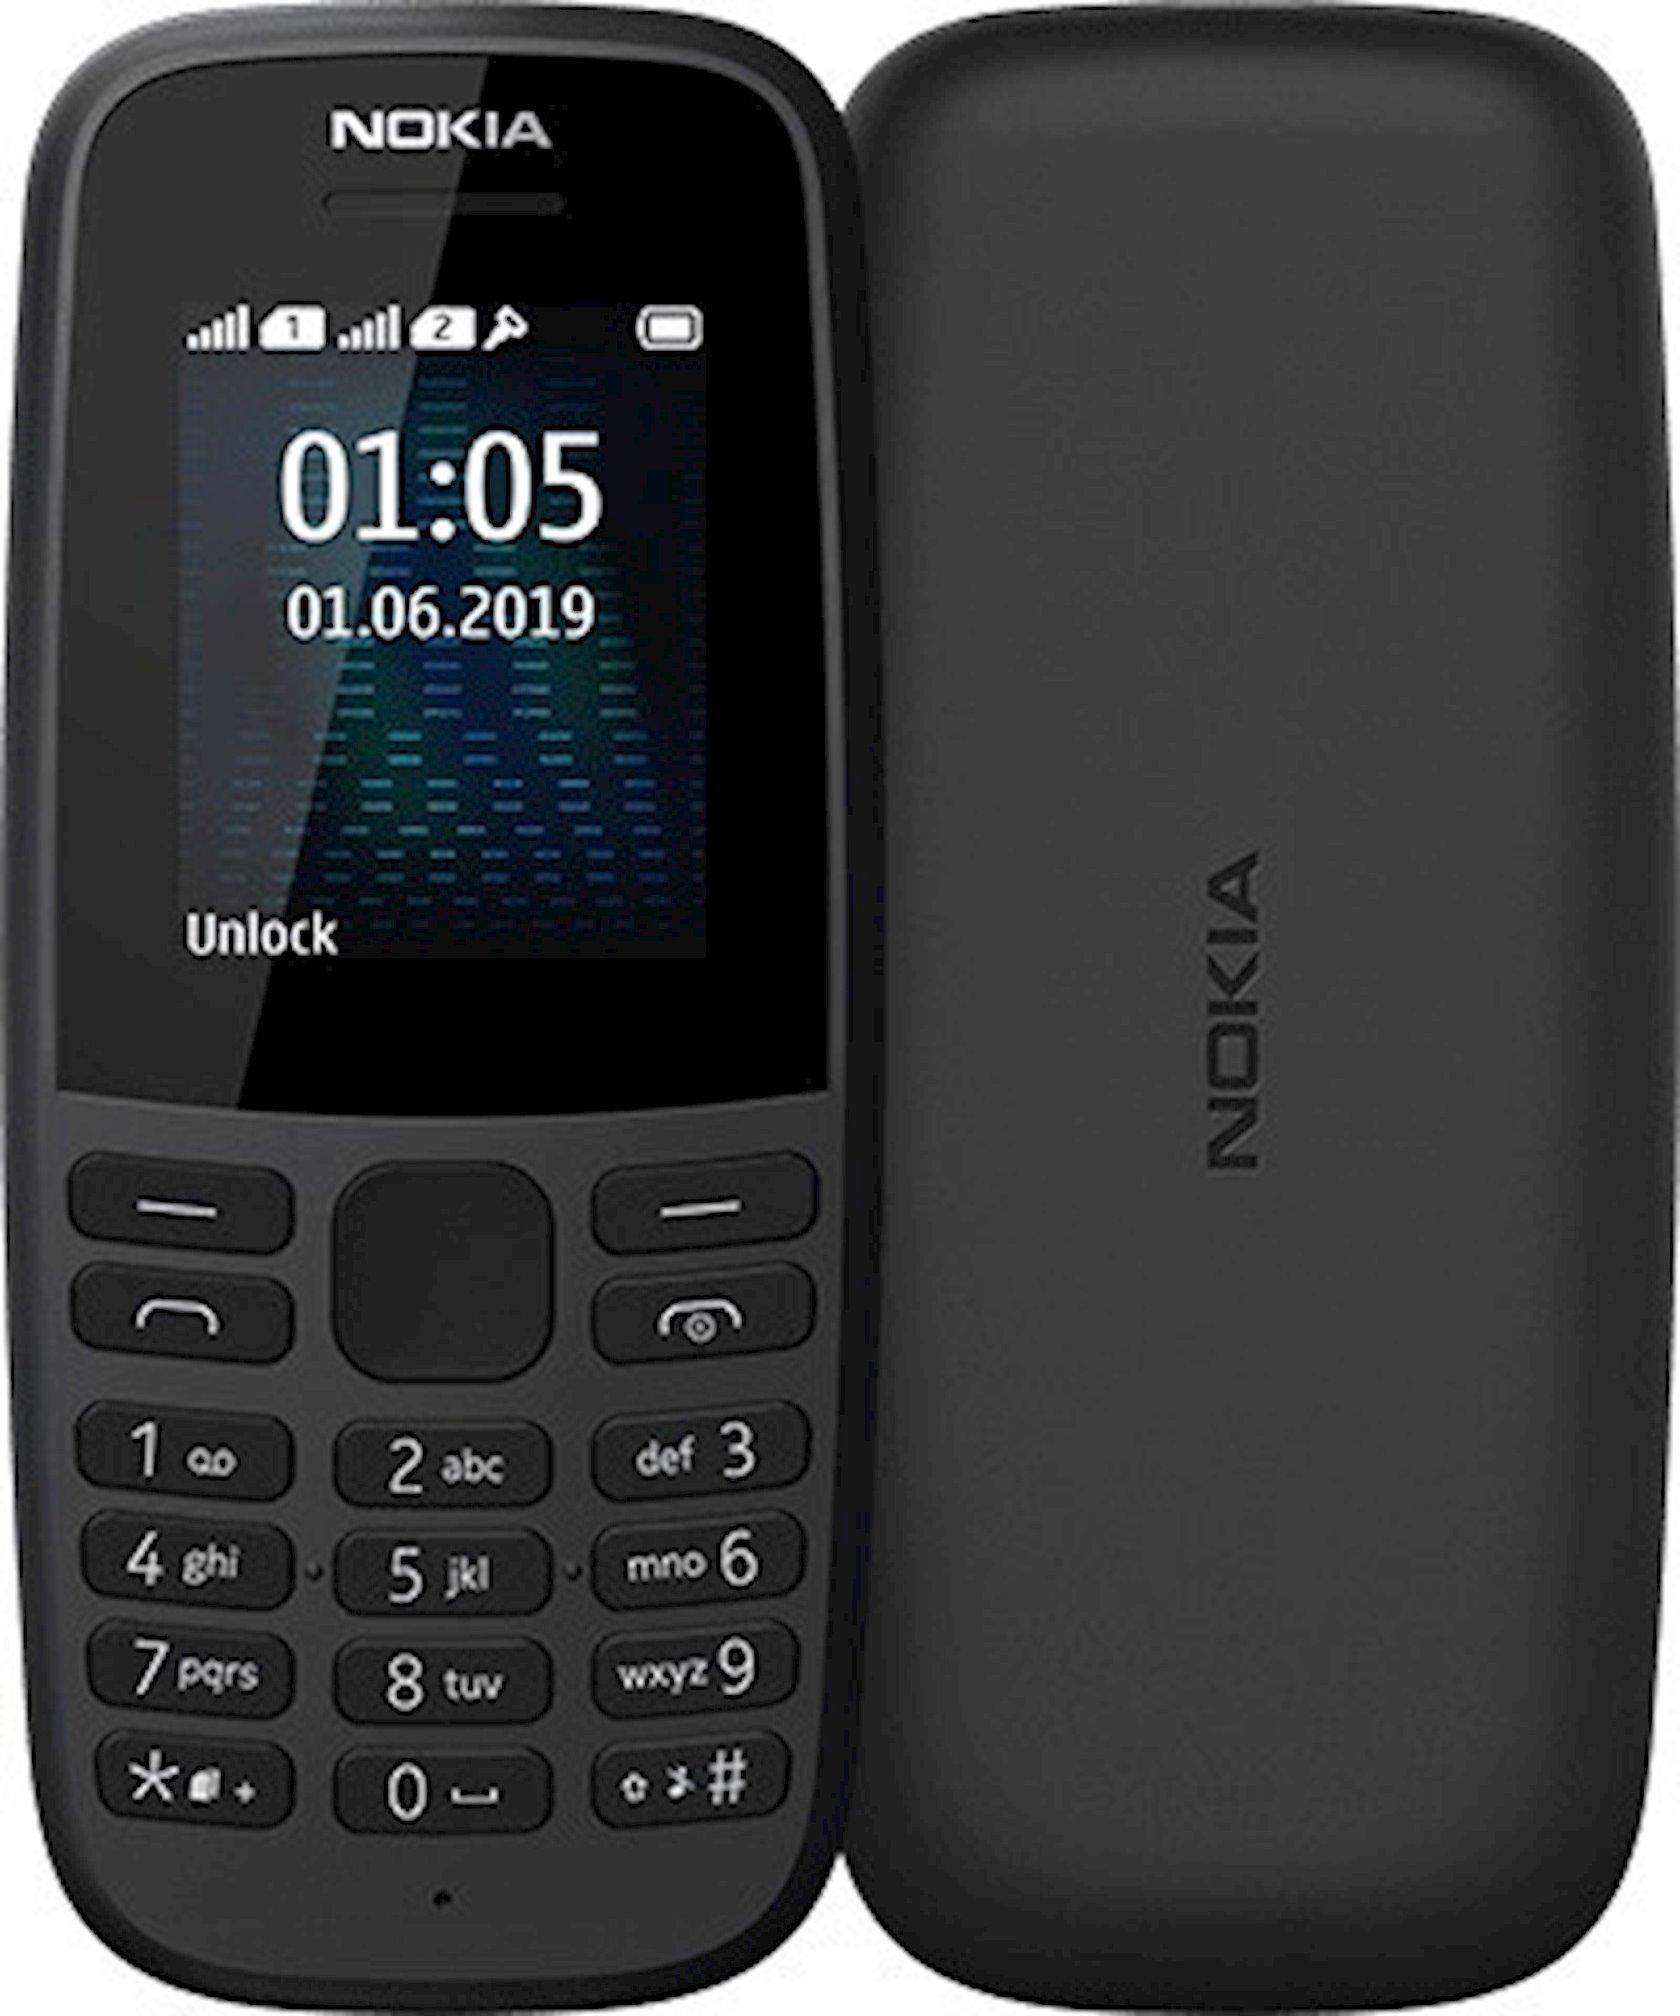 Mobil telefon Nokia 105 Dual Sim 2019 Black